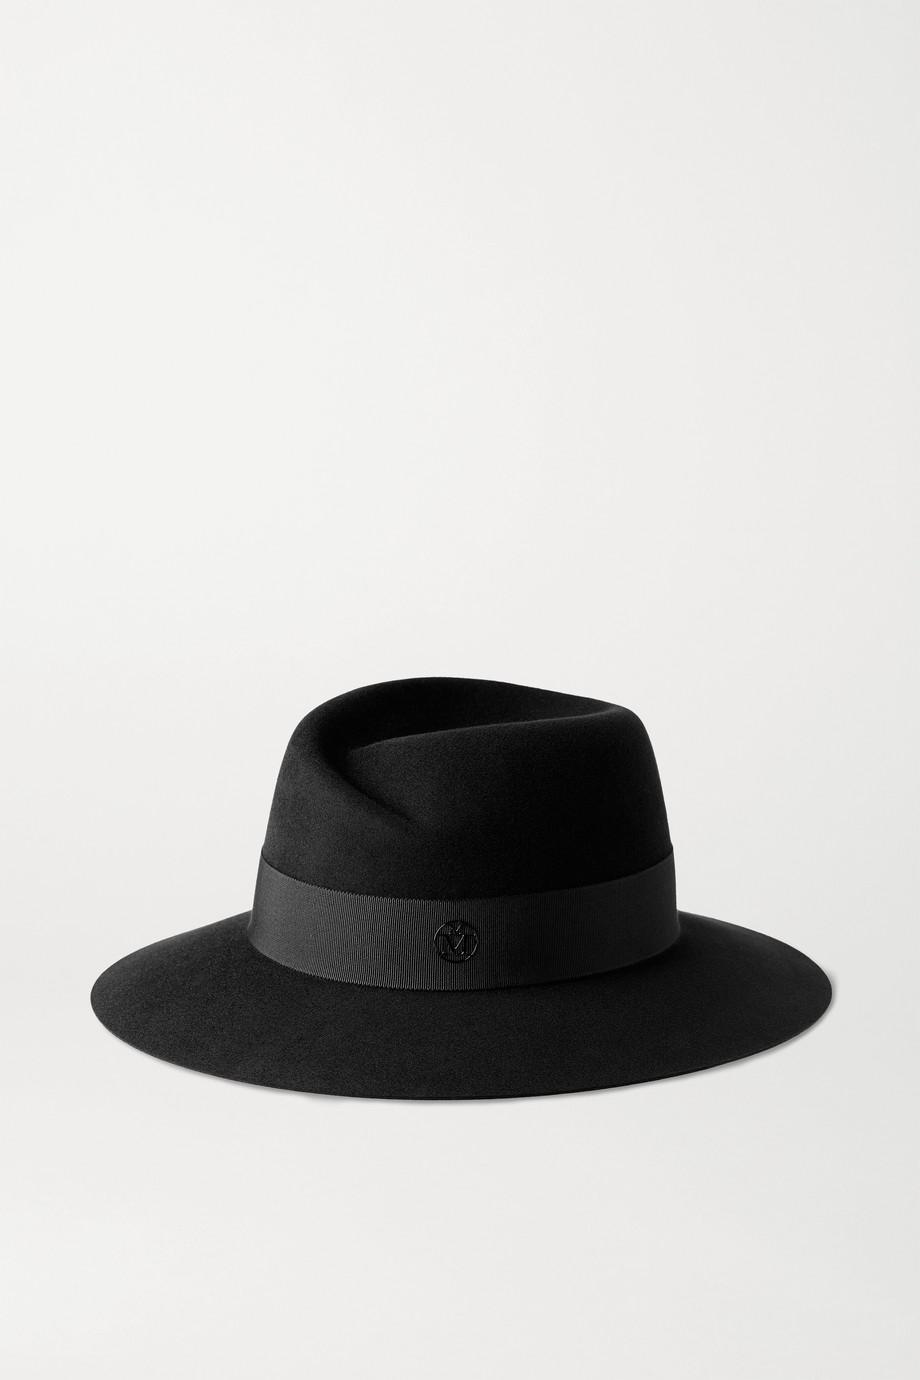 Maison Michel Virginie 罗缎边饰羊毛毡费多拉帽